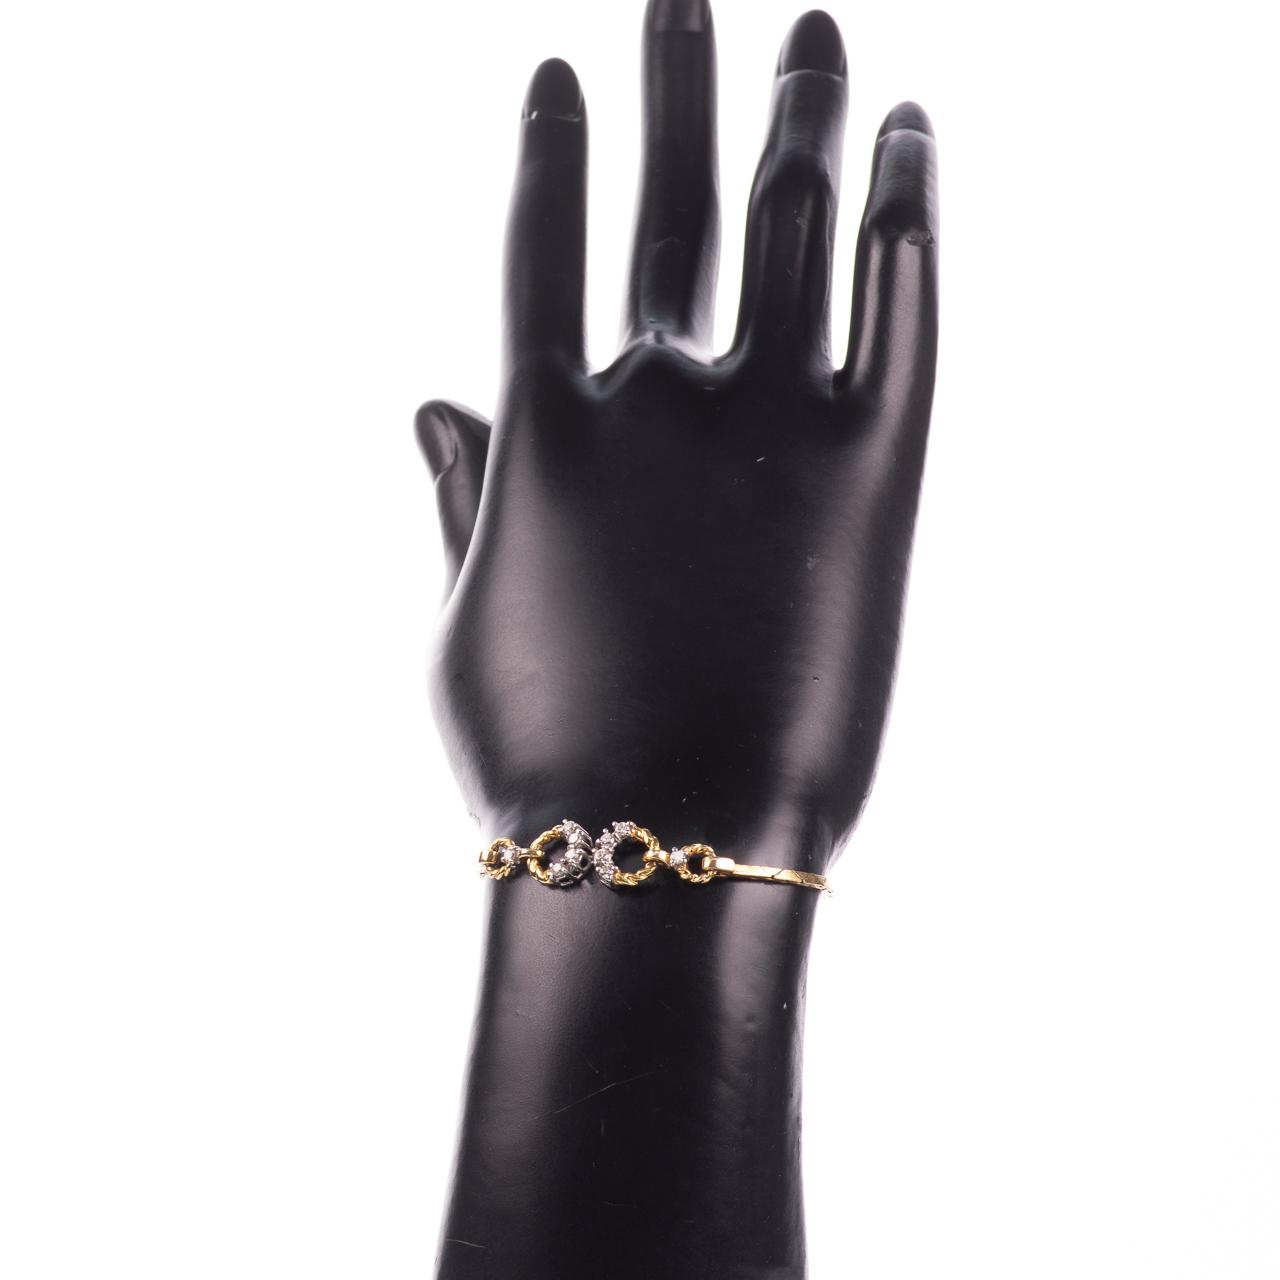 18ct Gold 0.30ct Diamond Bracelet - Image 2 of 6